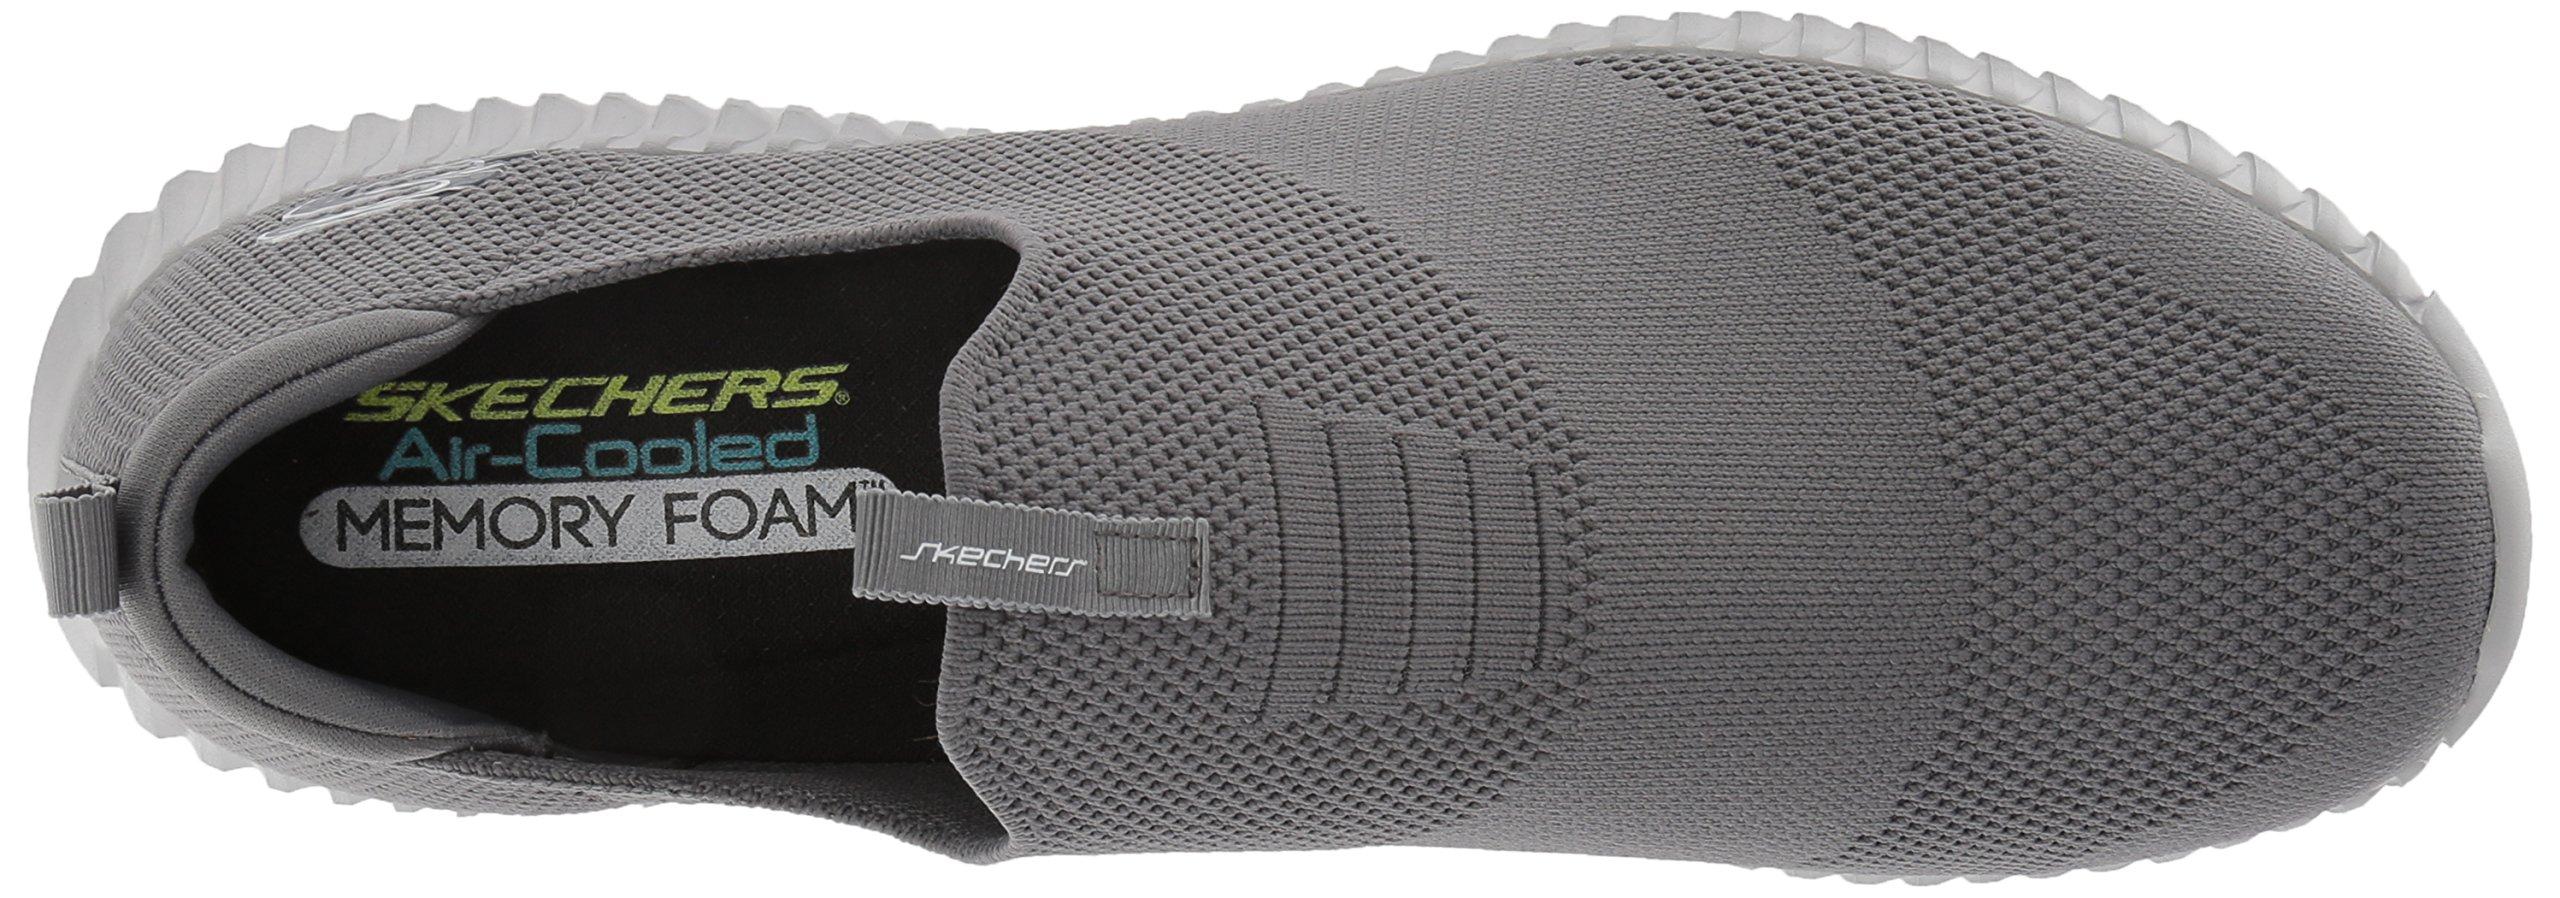 promo code first rate 2019 real Skechers Sport Men's Elite Flex Wasik Loafer,charcoal,10.0 M ...